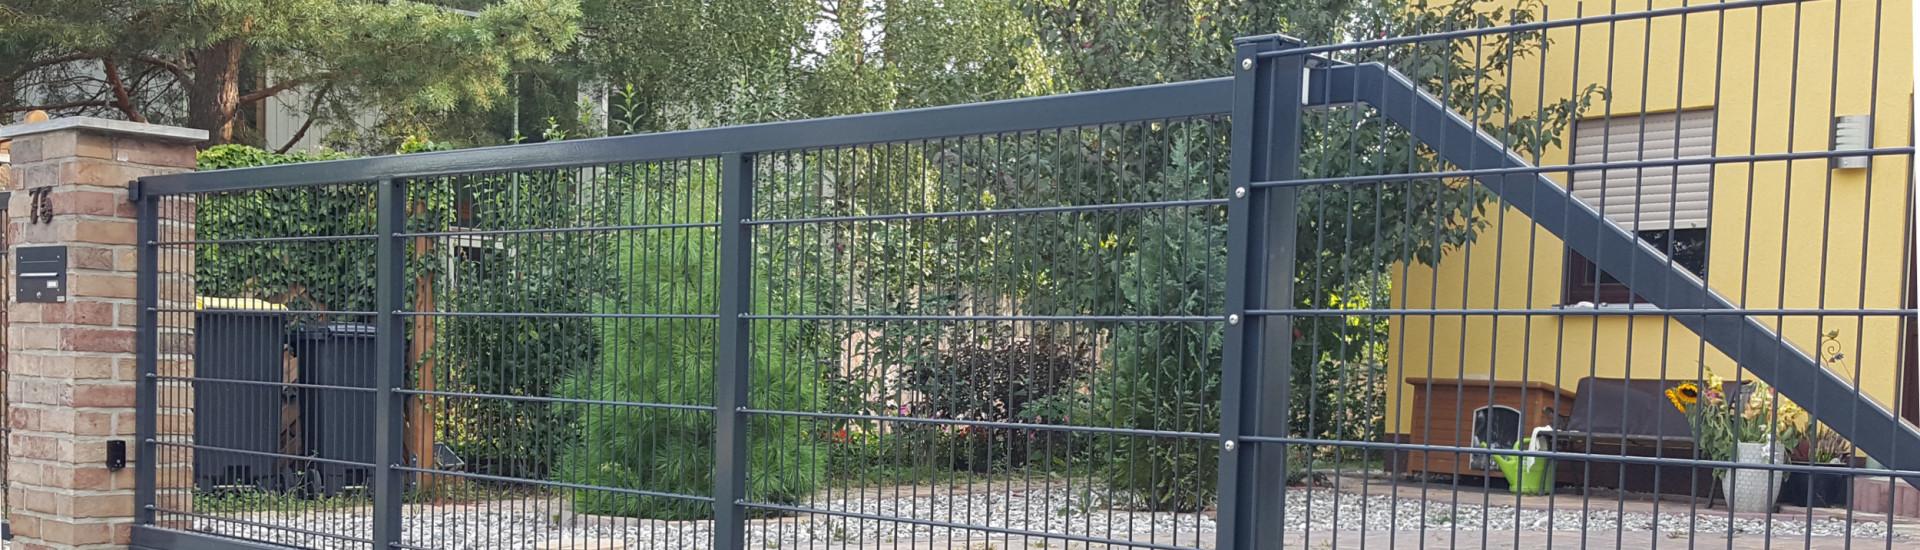 Günstige Metallzäune aus Polen – Nagamet